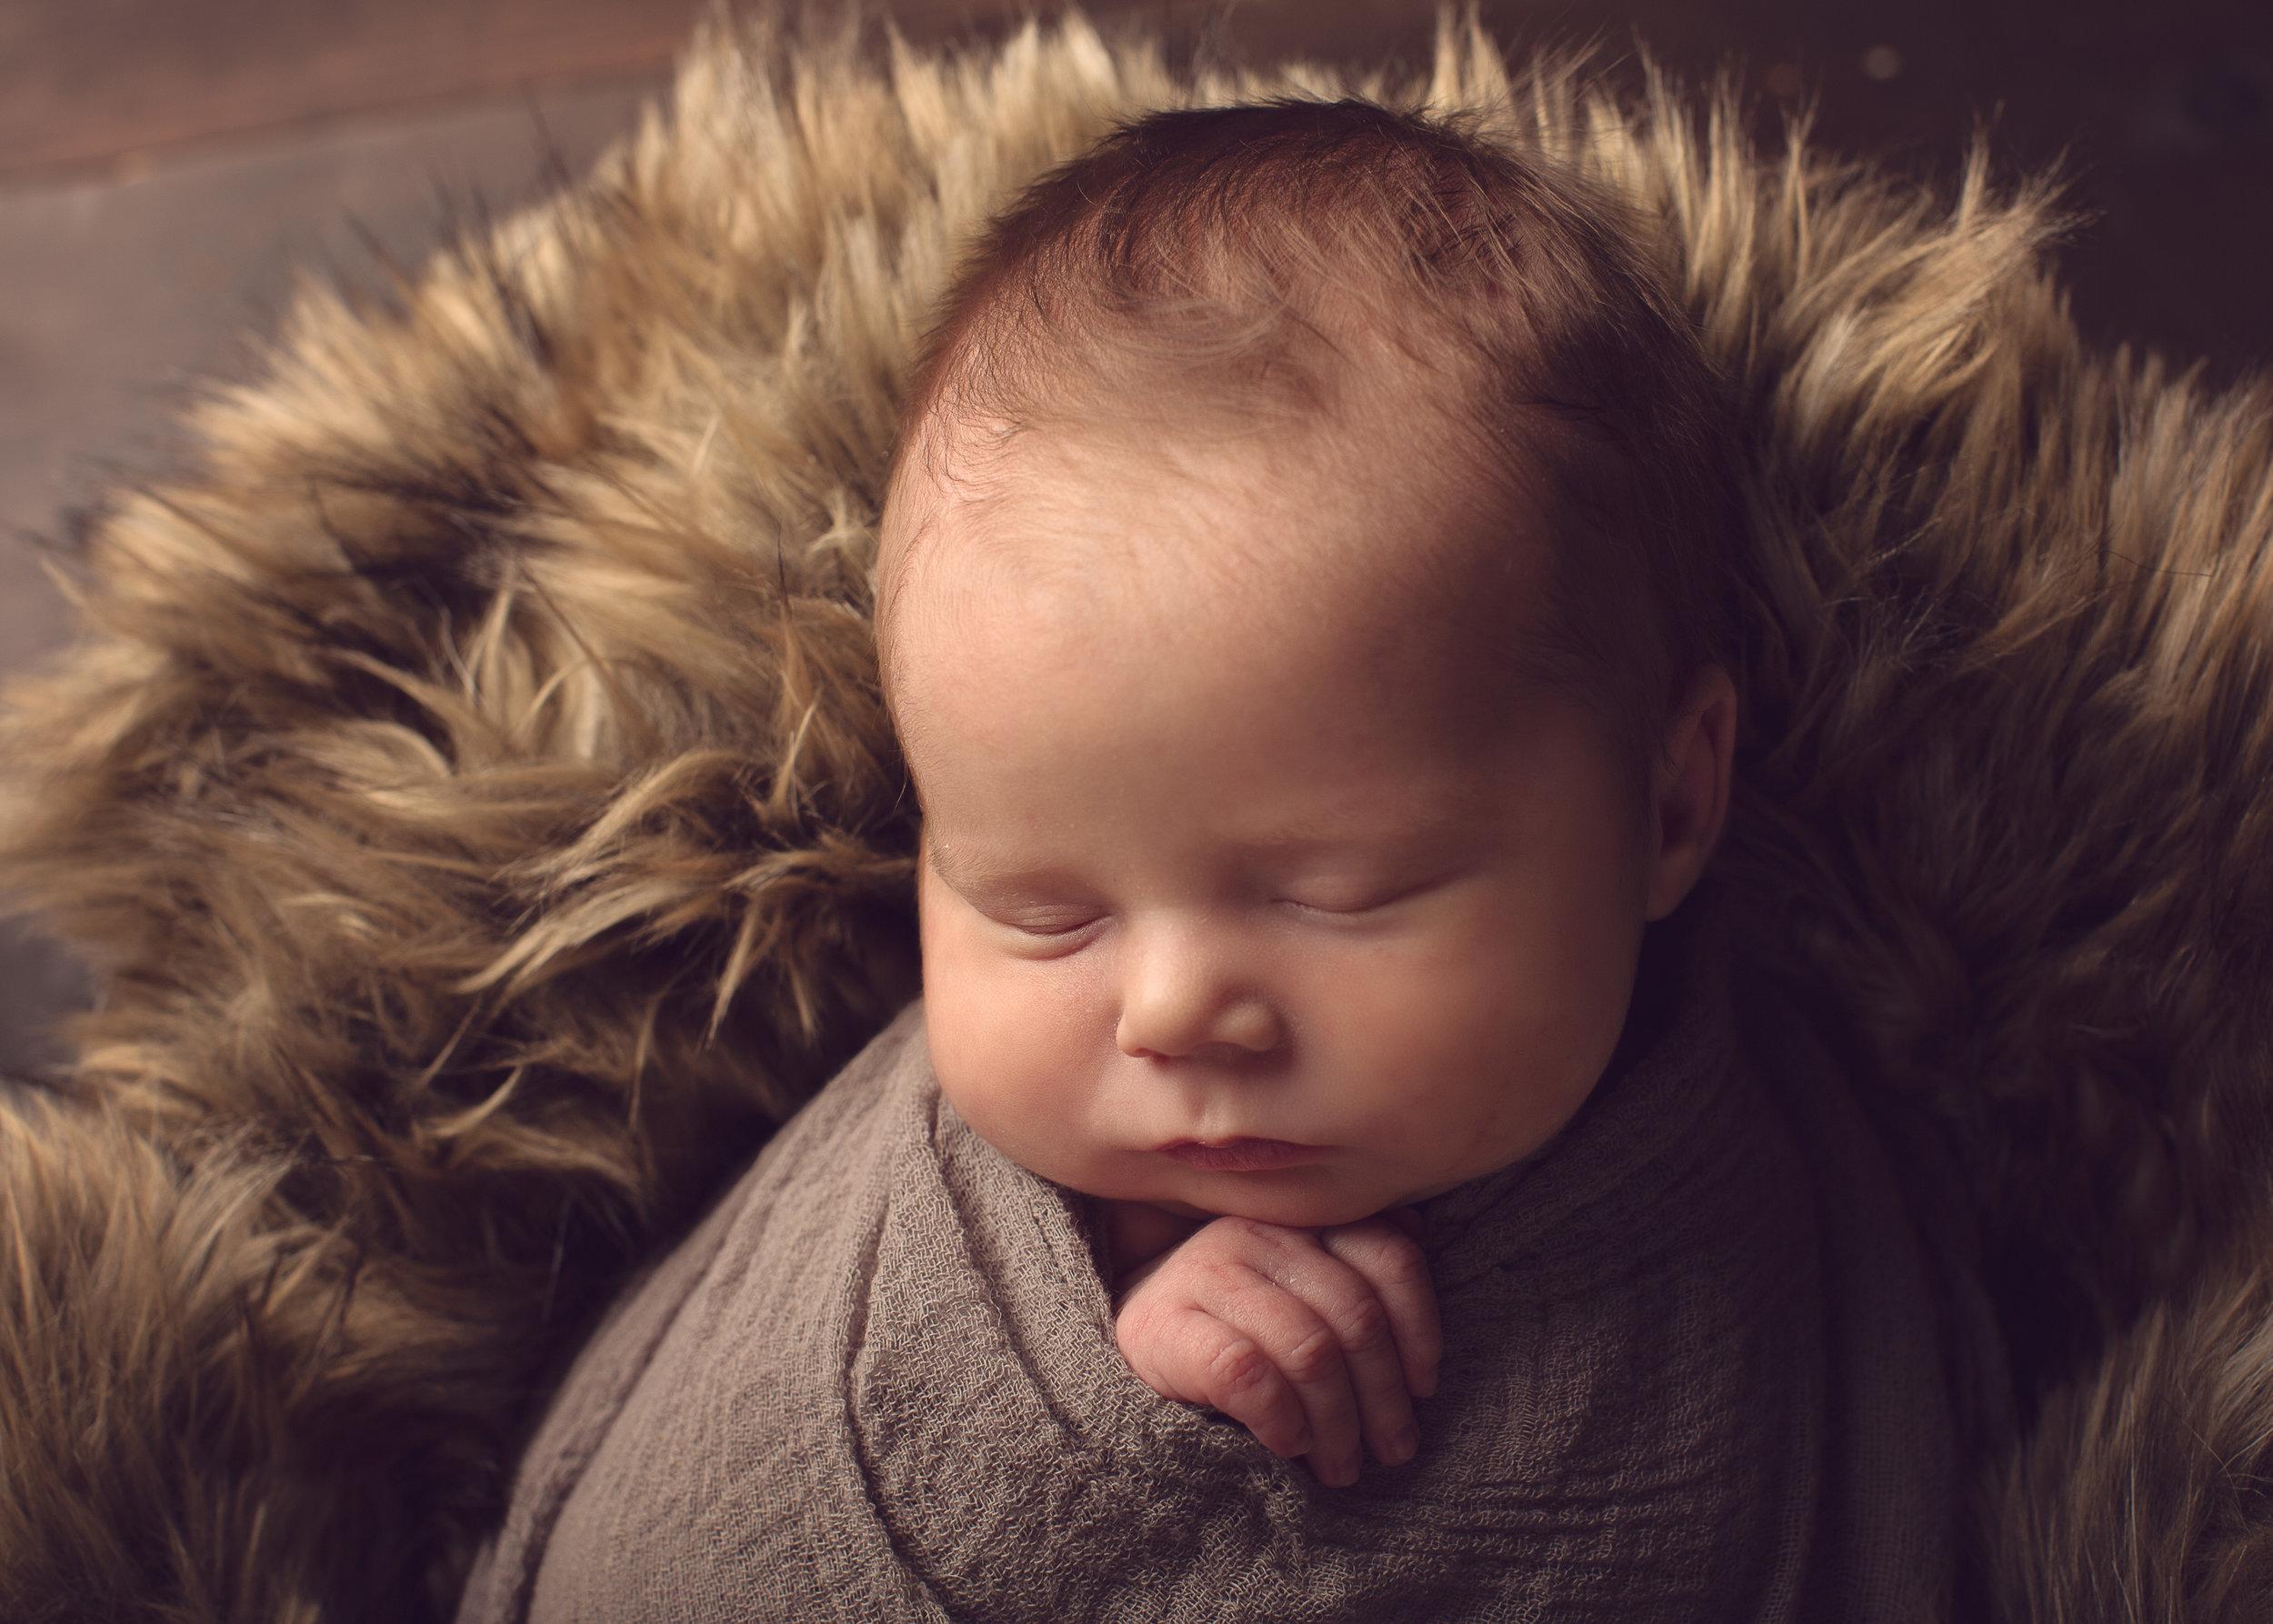 millbury_newborn_photographer_massachusetts_boston_baby_boy_photos2.jpg